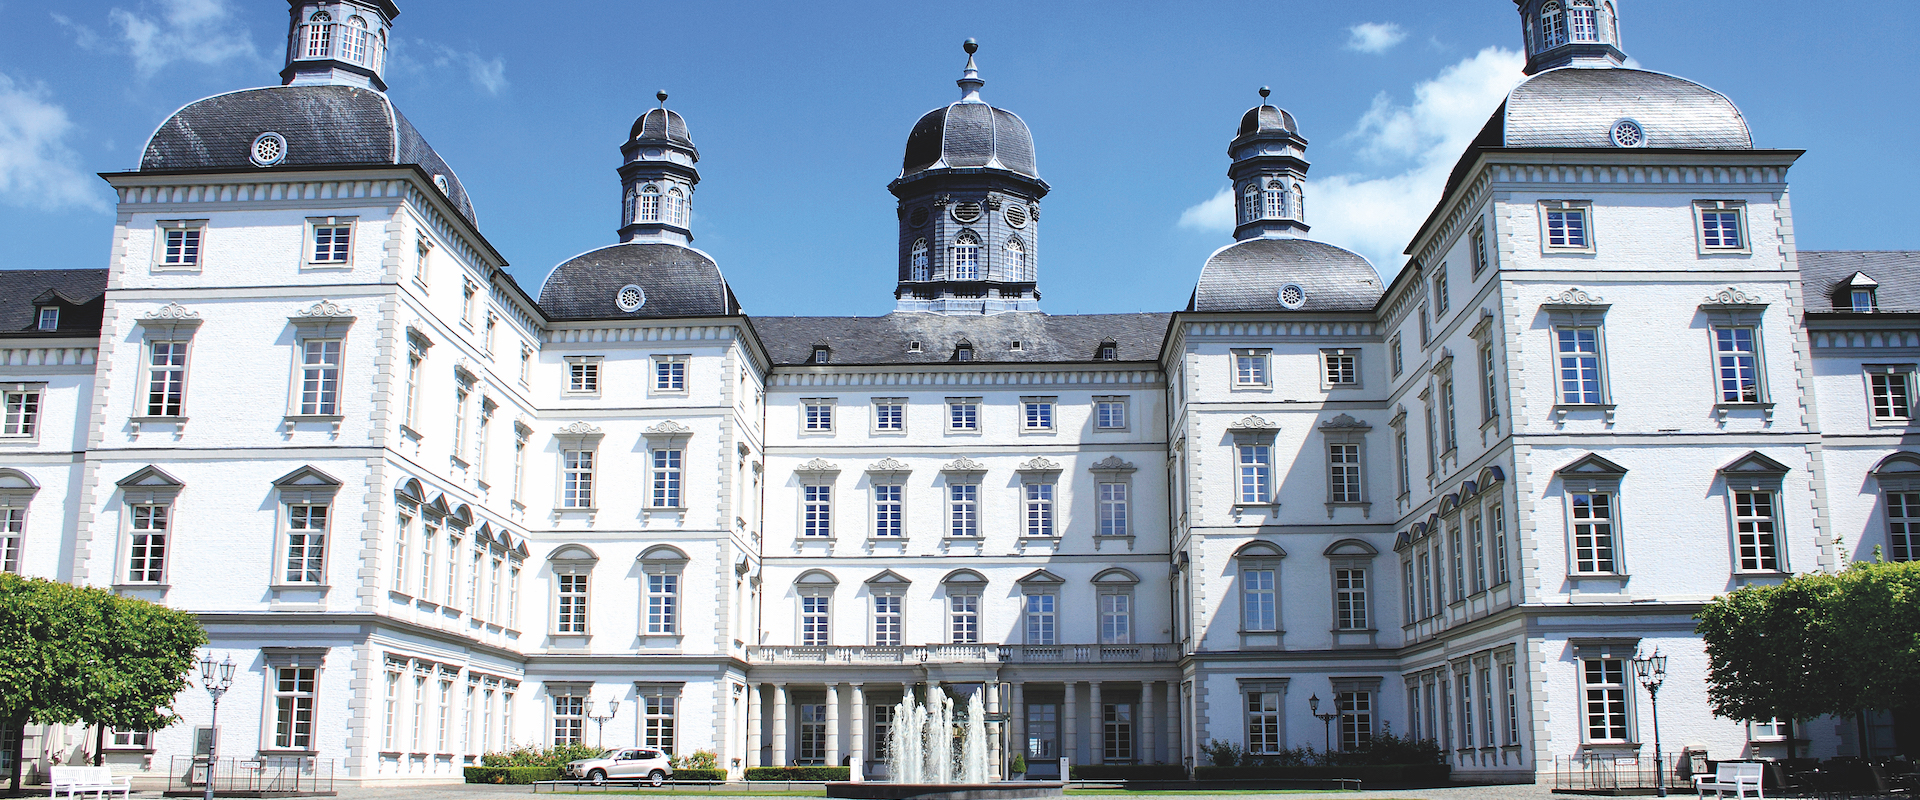 Schlosshotel Bensberg 0026